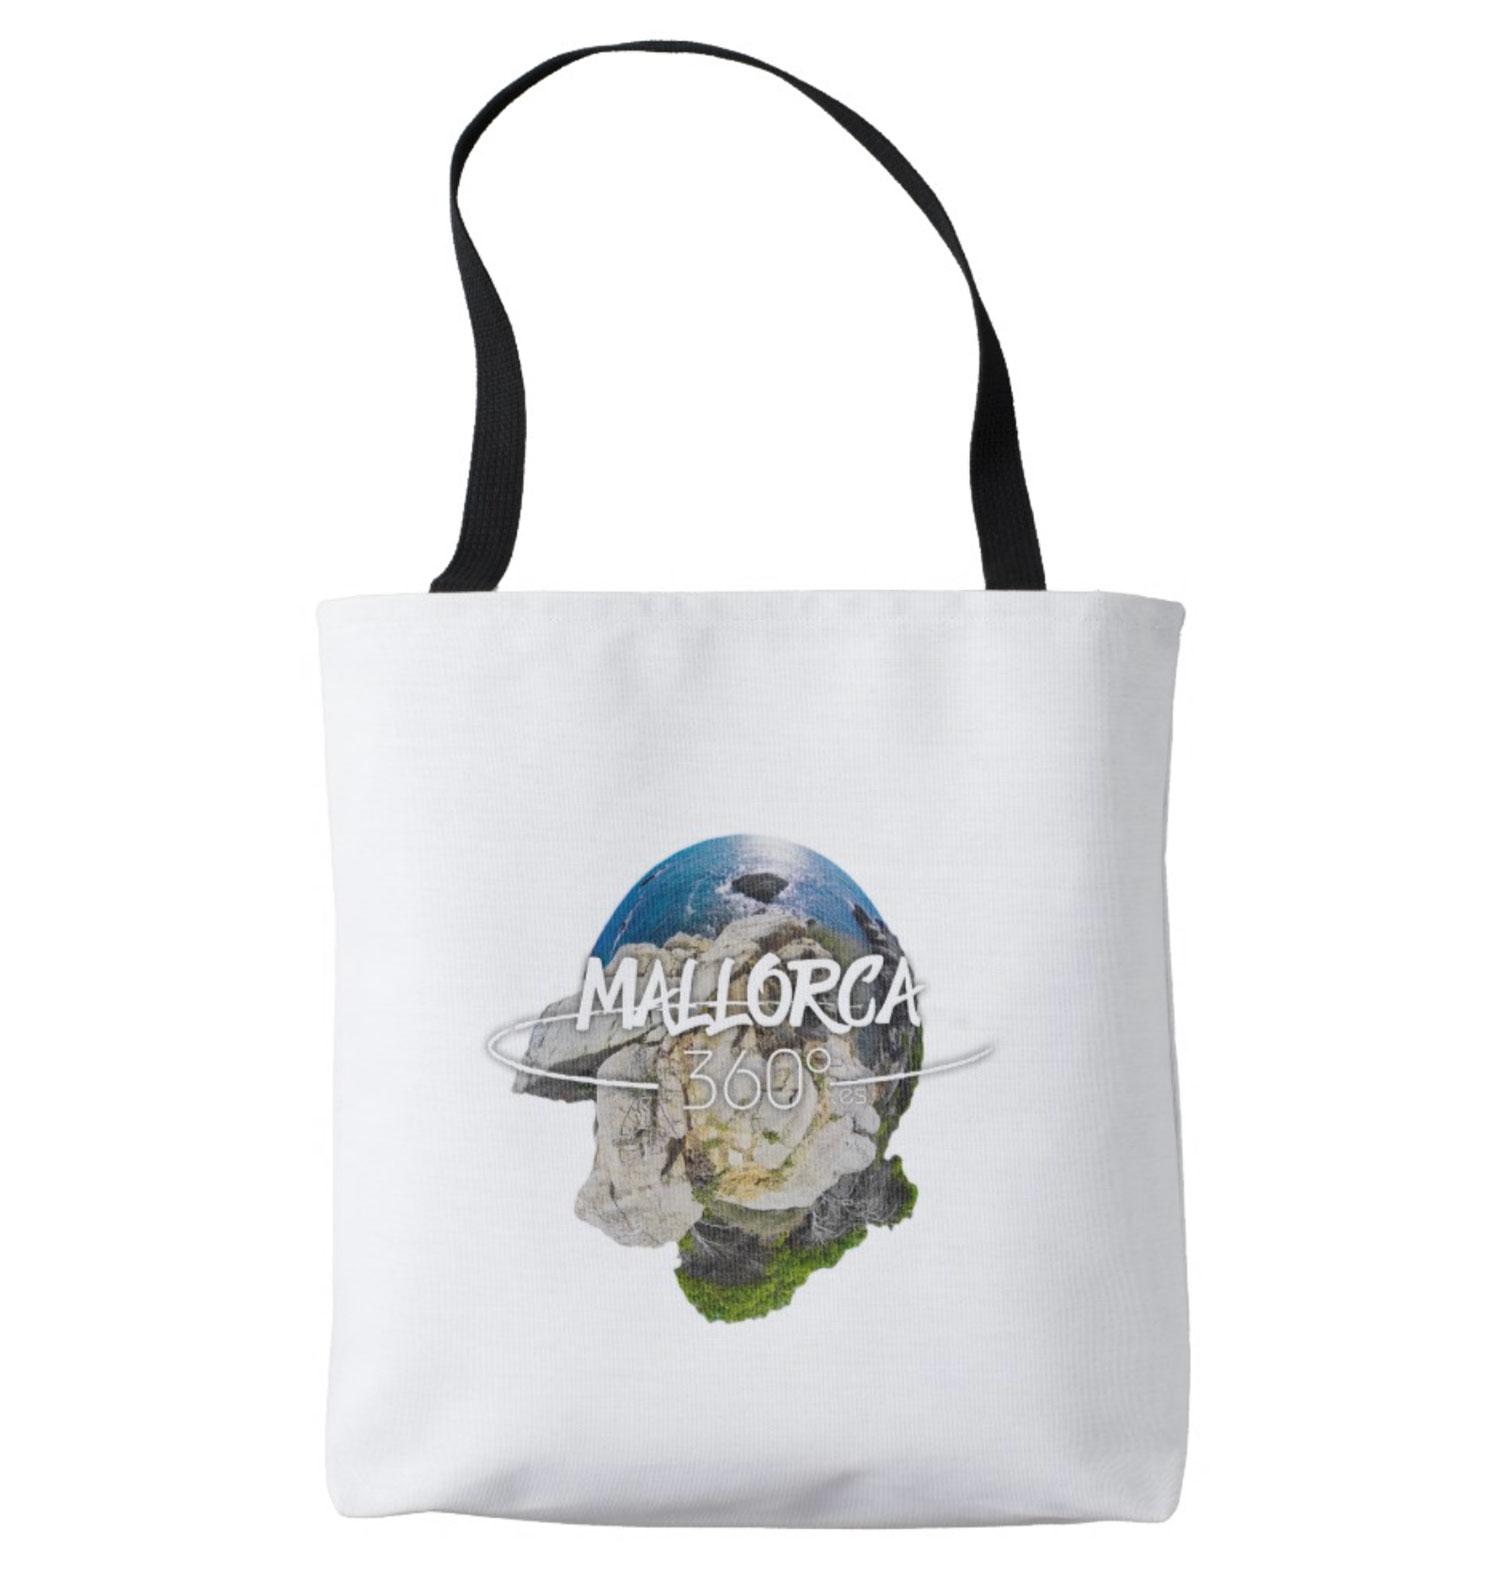 Mallorca 360 Classic Tote Bag with Base Logo